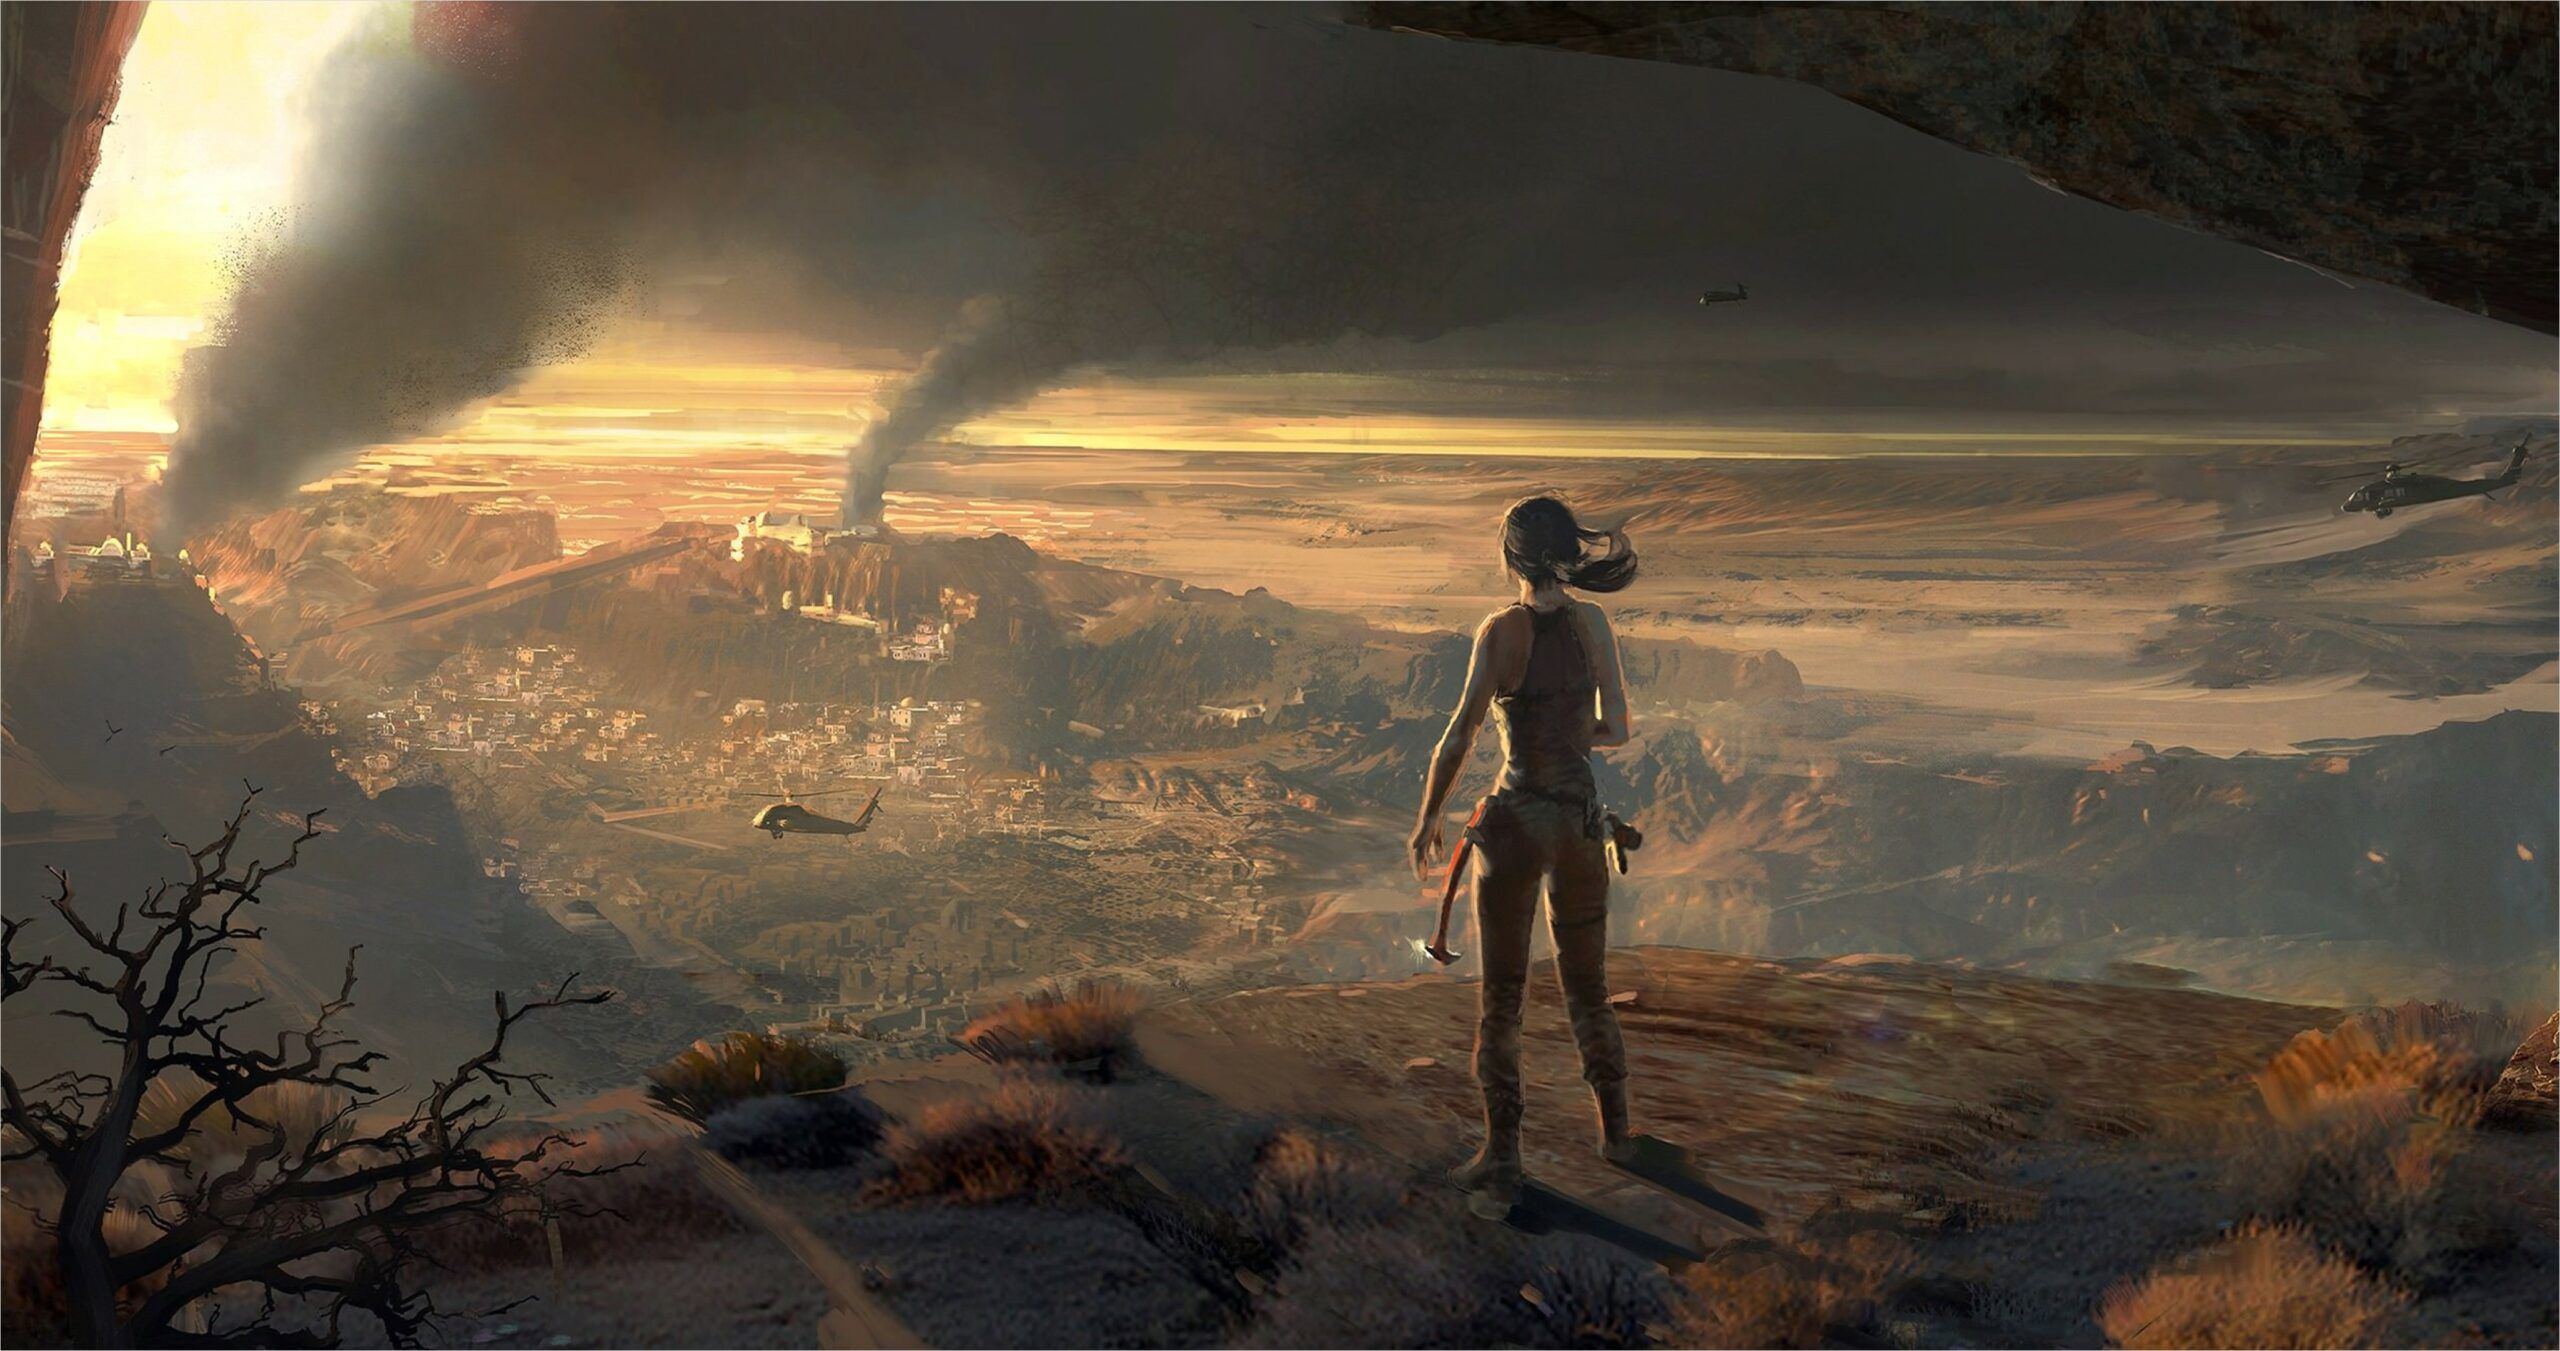 300 Rise Of An Empire 4k Wallpaper Tomb Raider Art Tomb Raider Rise Of The Tomb